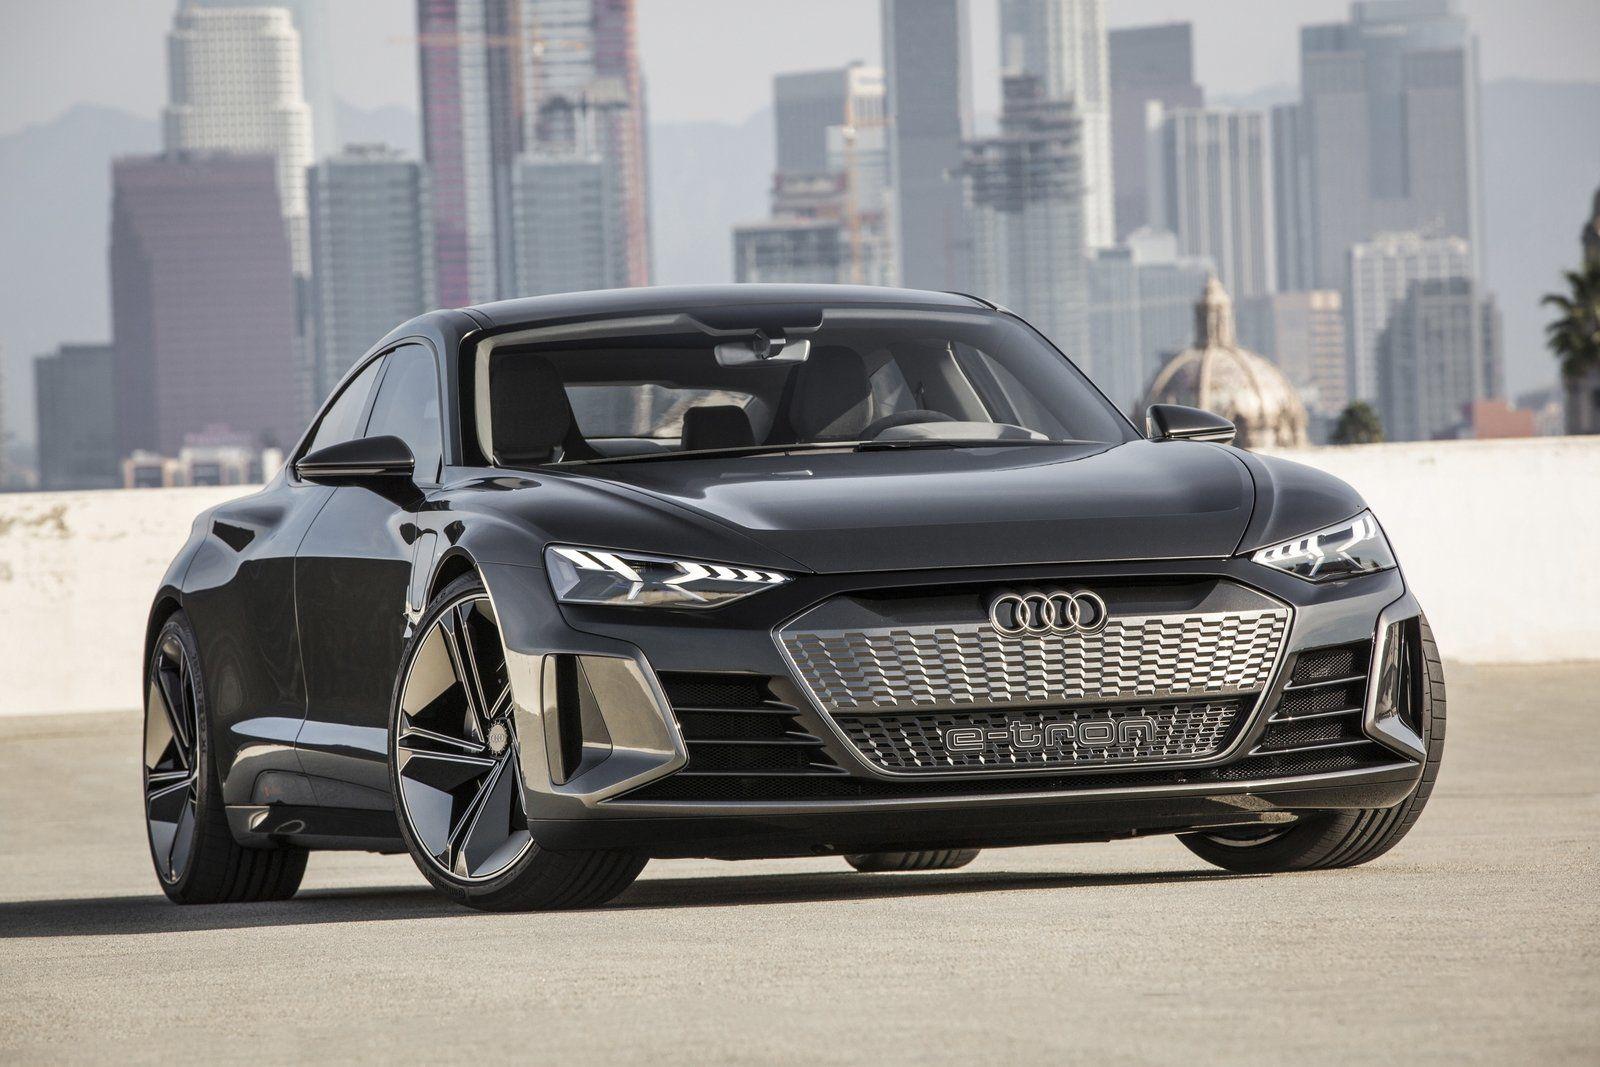 The Streamlined Audi E Tron Gt Looks Like It Was Inspired By A Wind Tunnel Test In 2020 Audi E Tron E Tron Audi